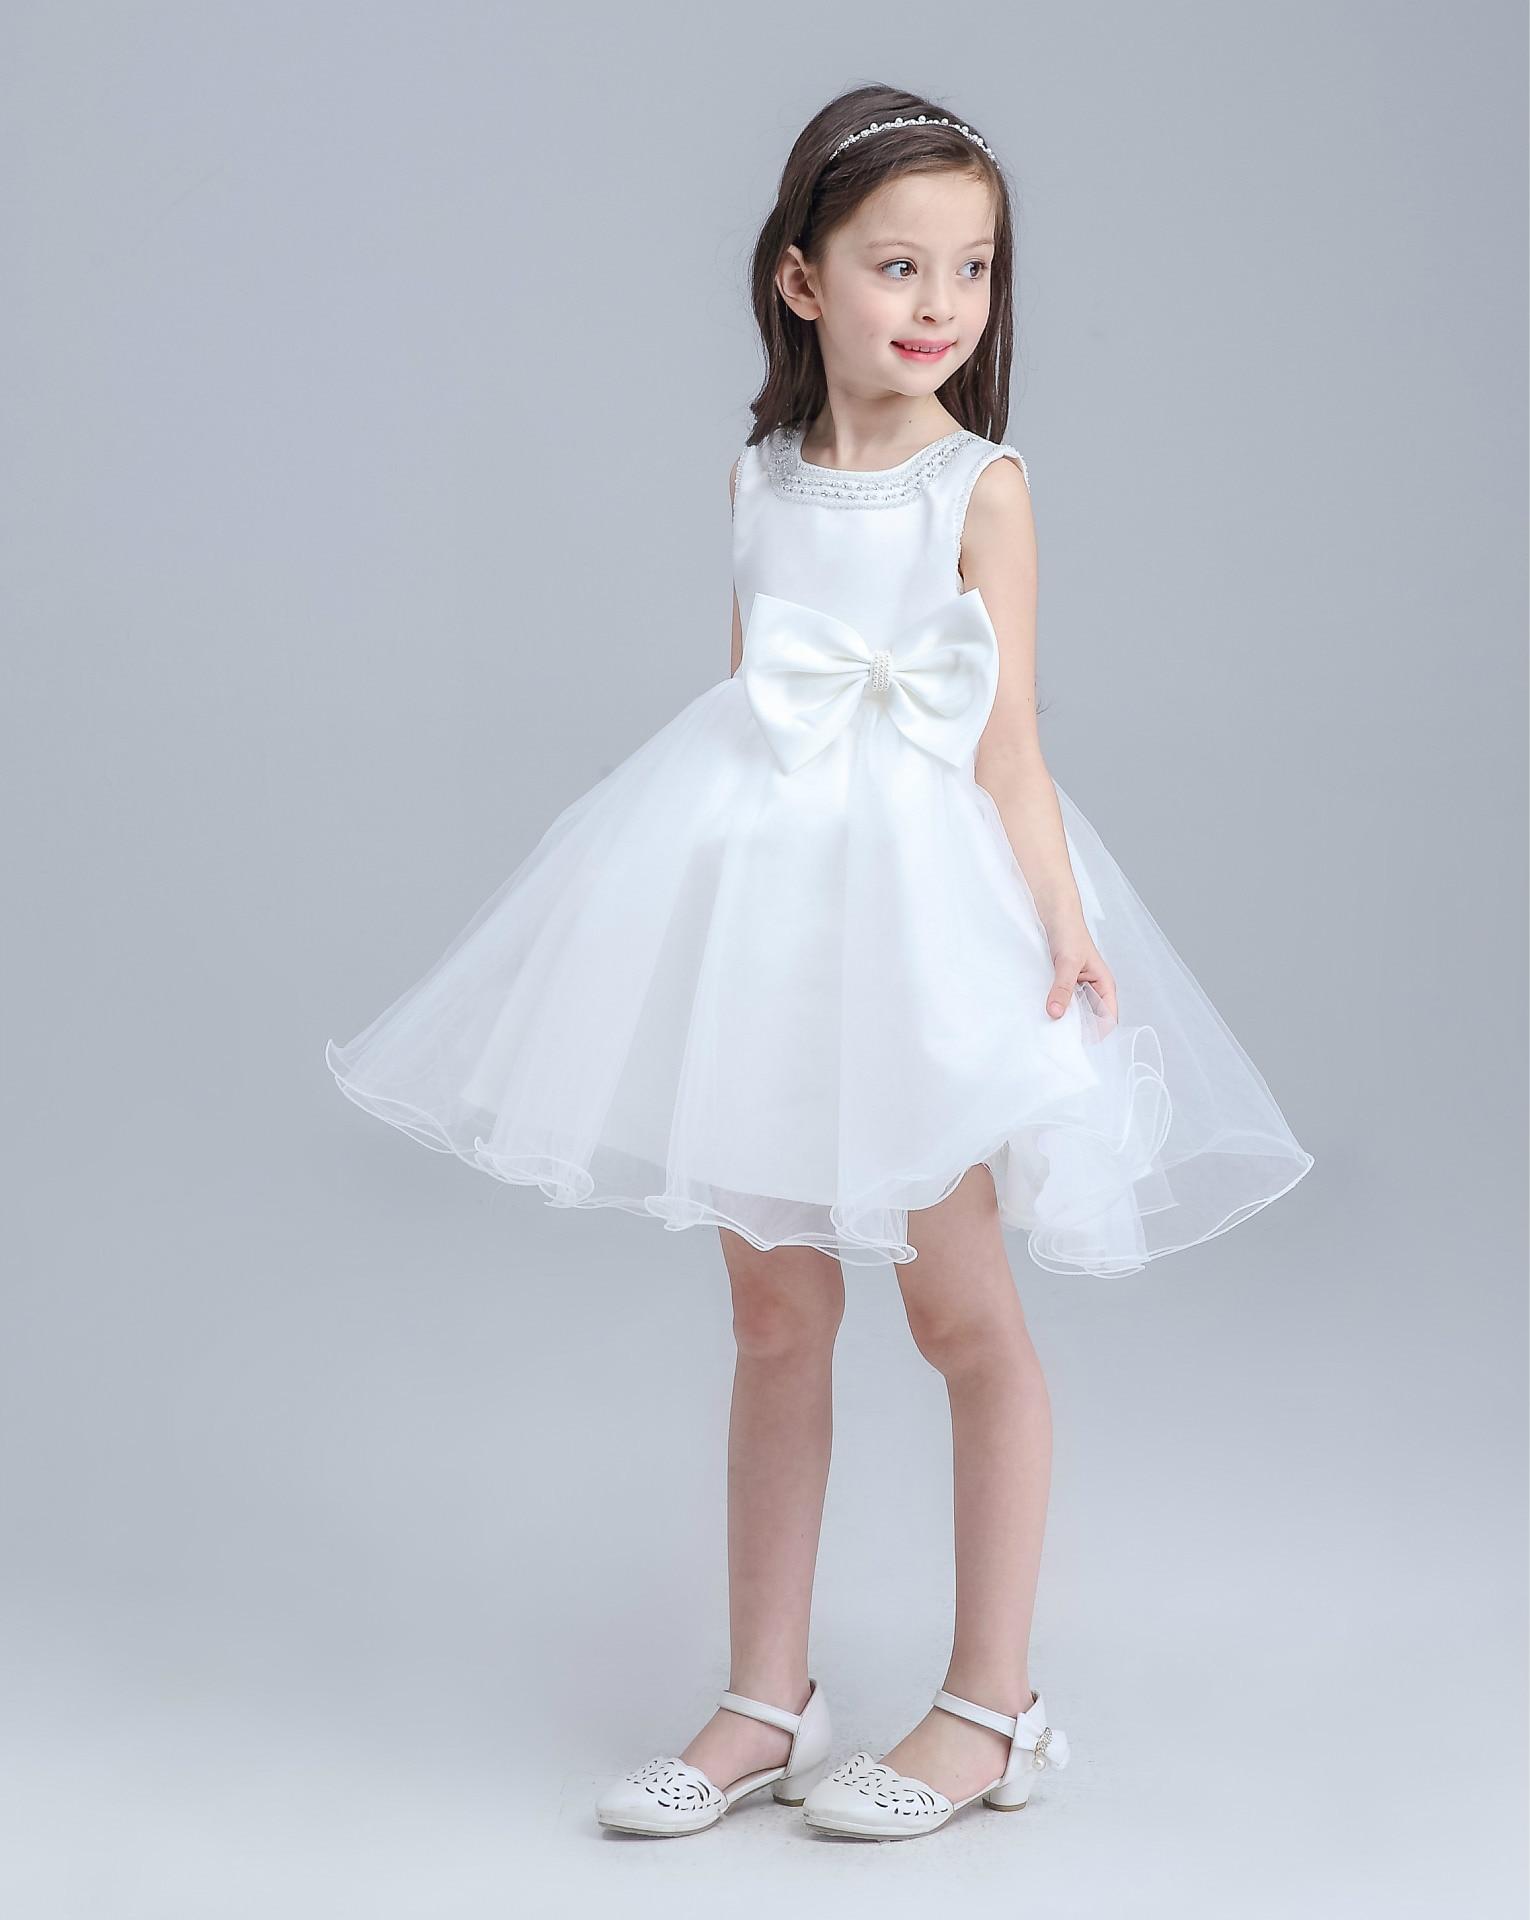 Amazing Black White Party Dresses Inspiration - All Wedding Dresses ...